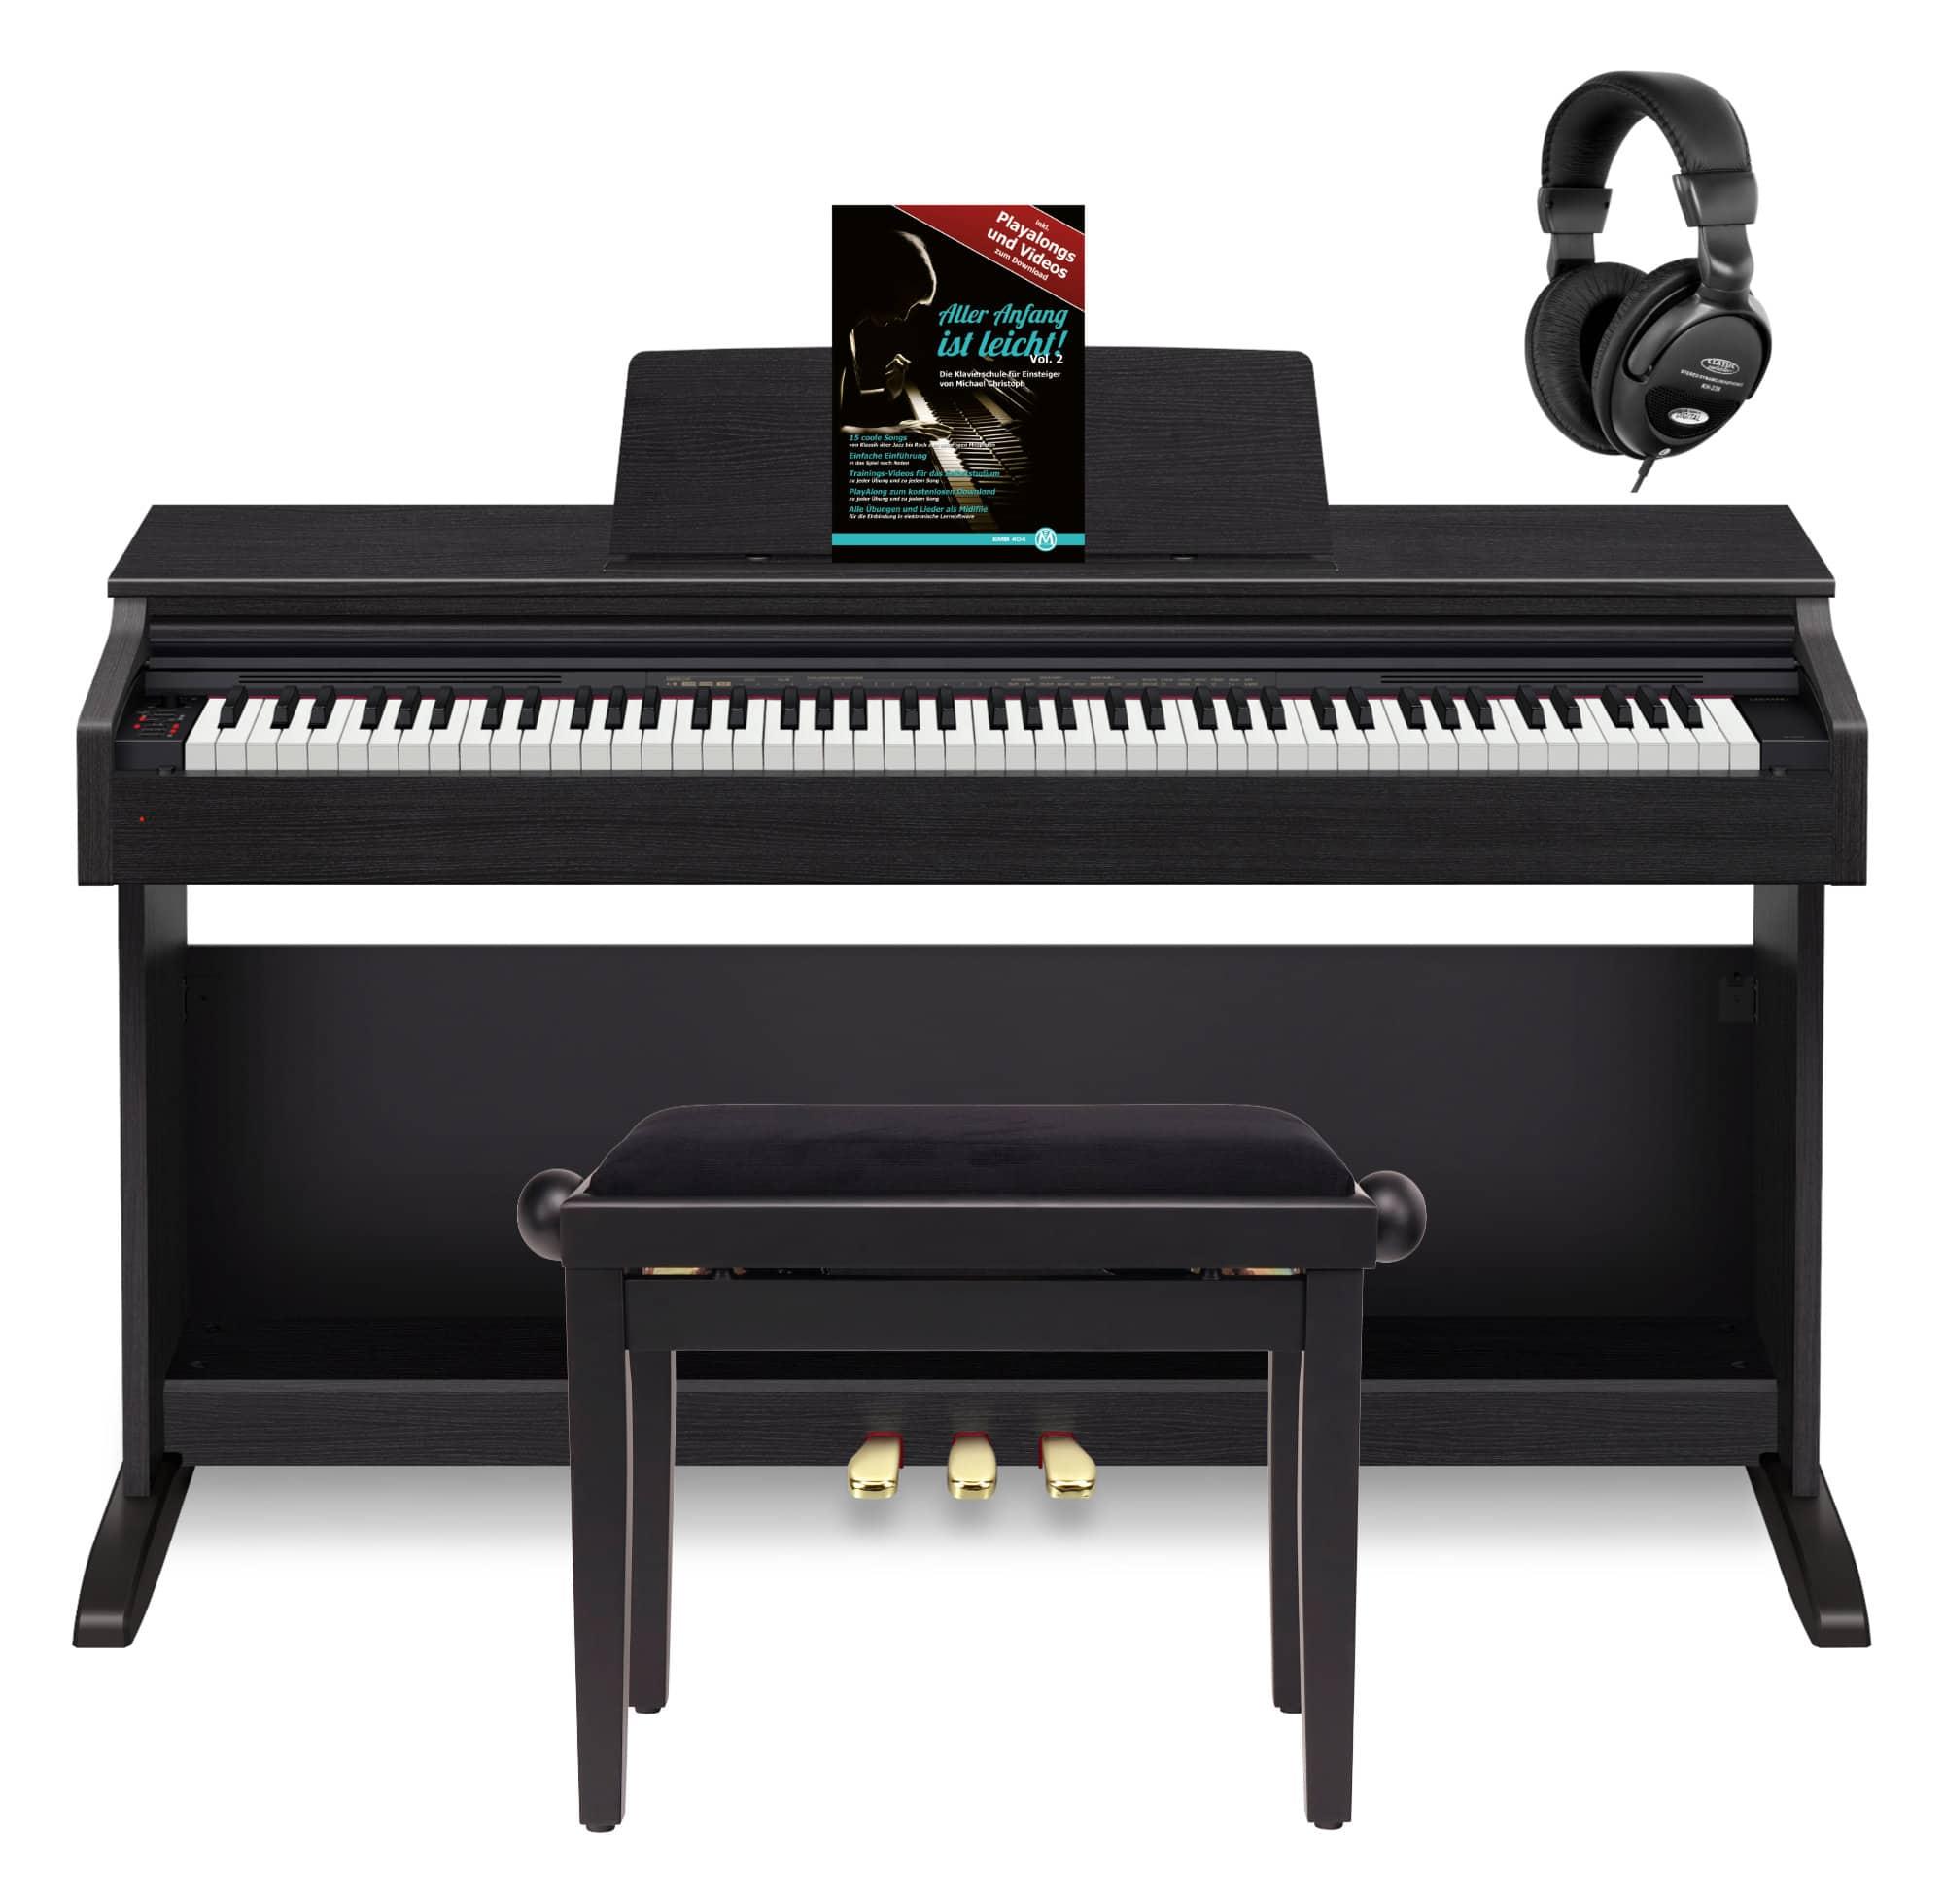 Casio Celviano AP 270 BK Digitalpiano schwarz Set inkl. Bank, Kopfhörer Schule